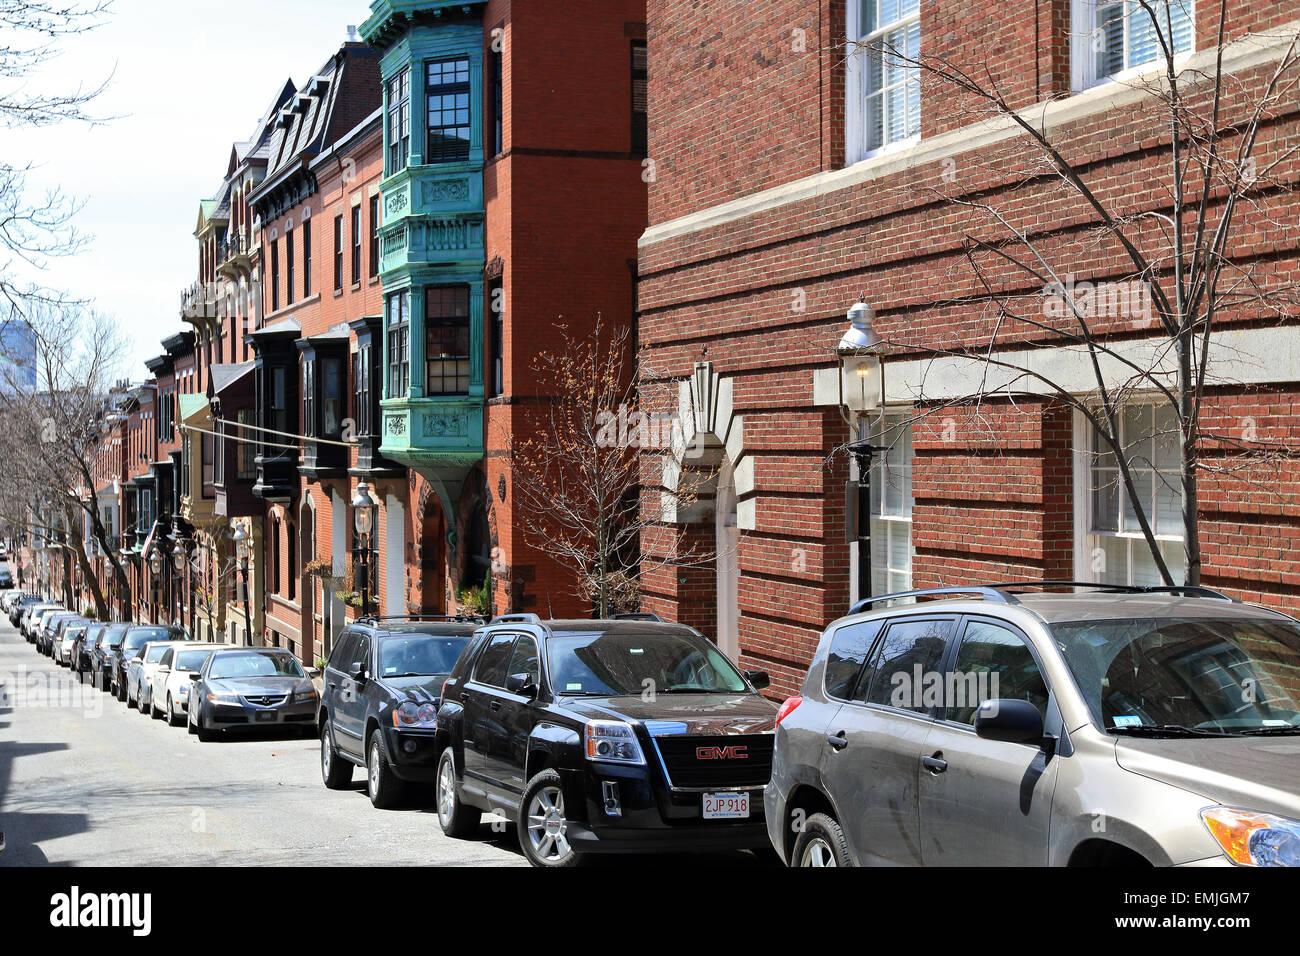 Boston Massachusetts Bunker Hill appartements et condominiums scène de rue. Photo Stock